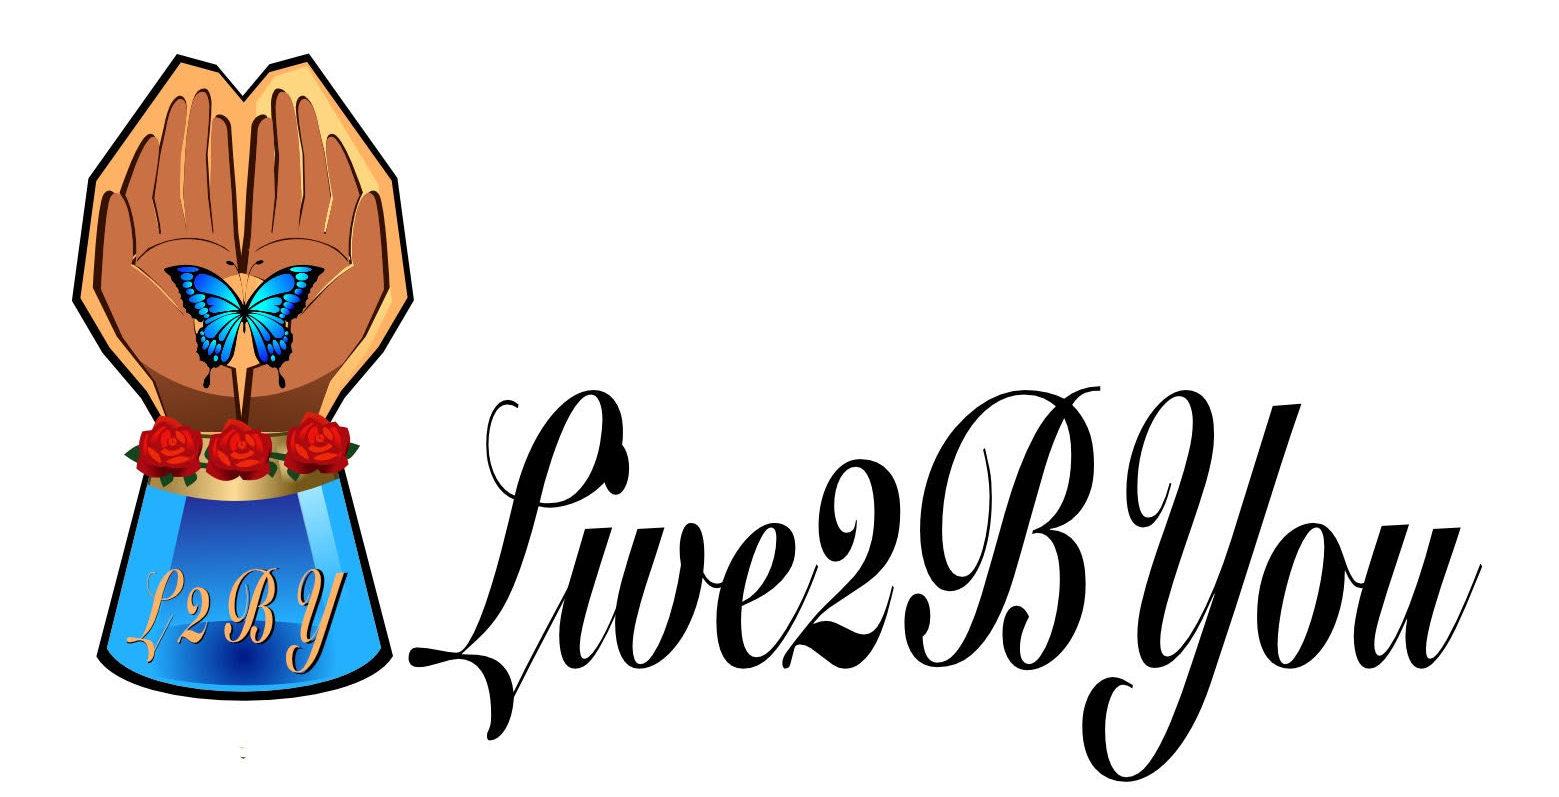 Live2byou